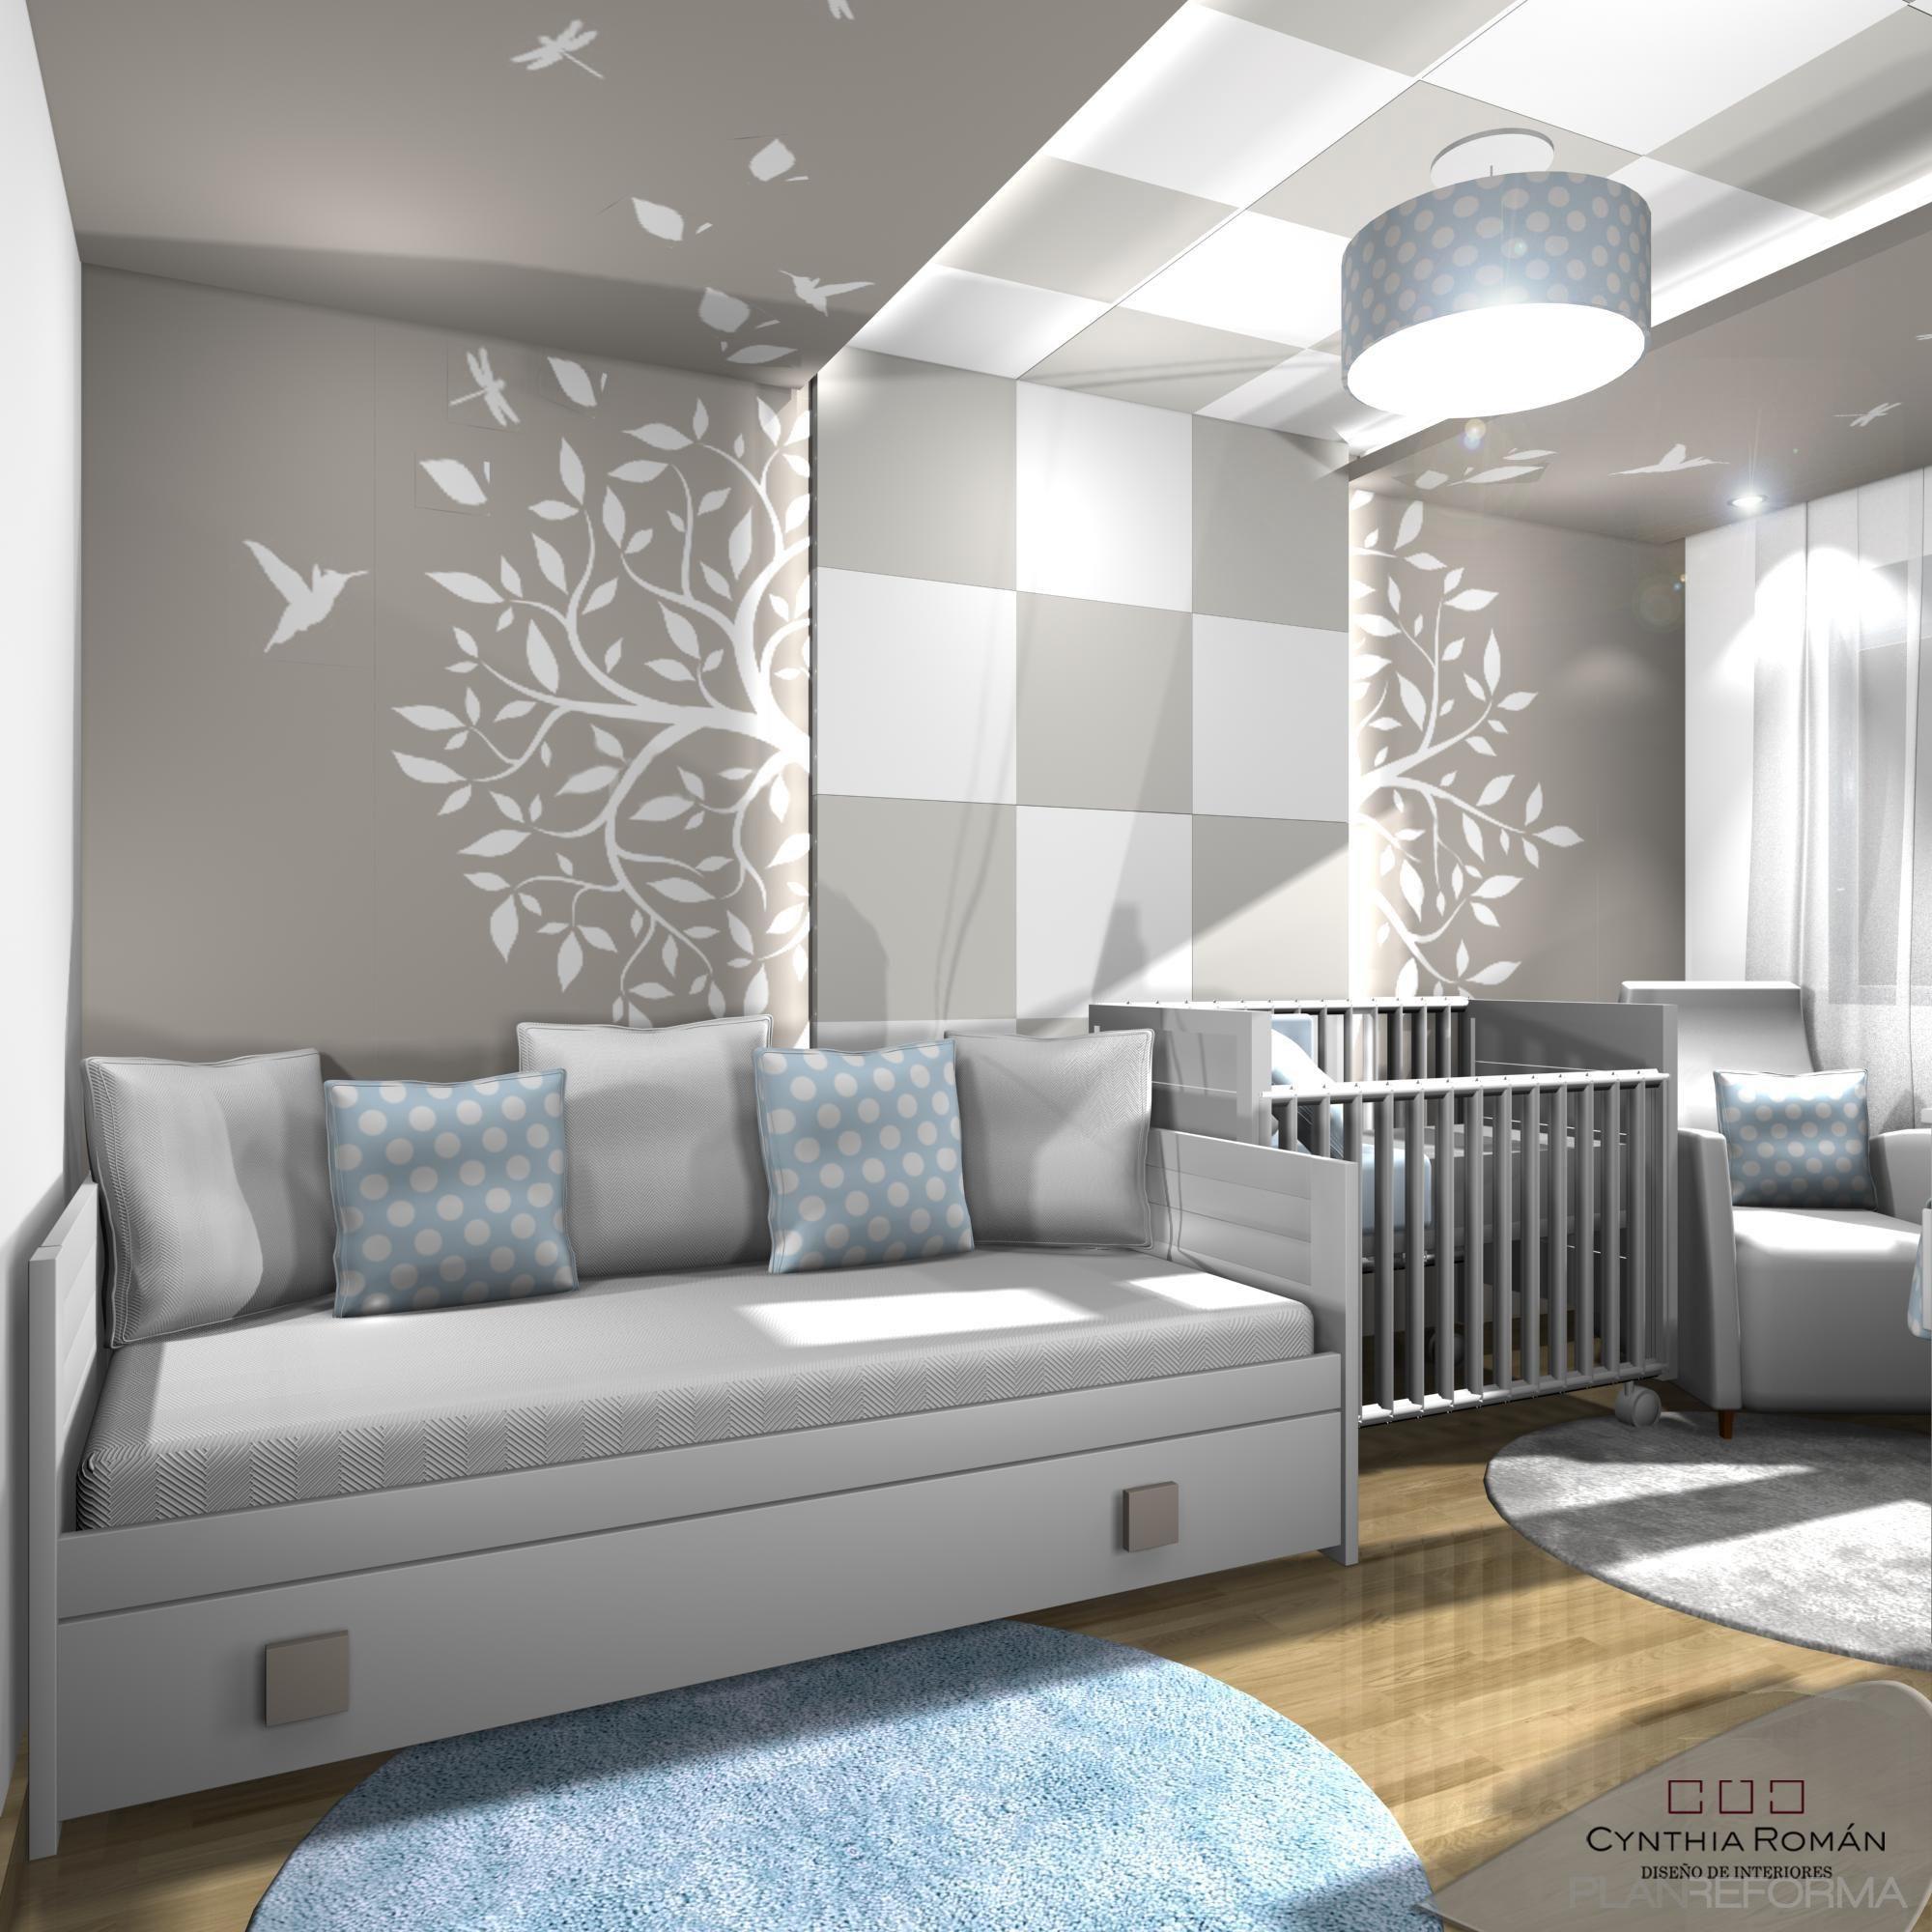 Dormitorio Salon Estilo Moderno Color Blanco Gris Dise Ado Por